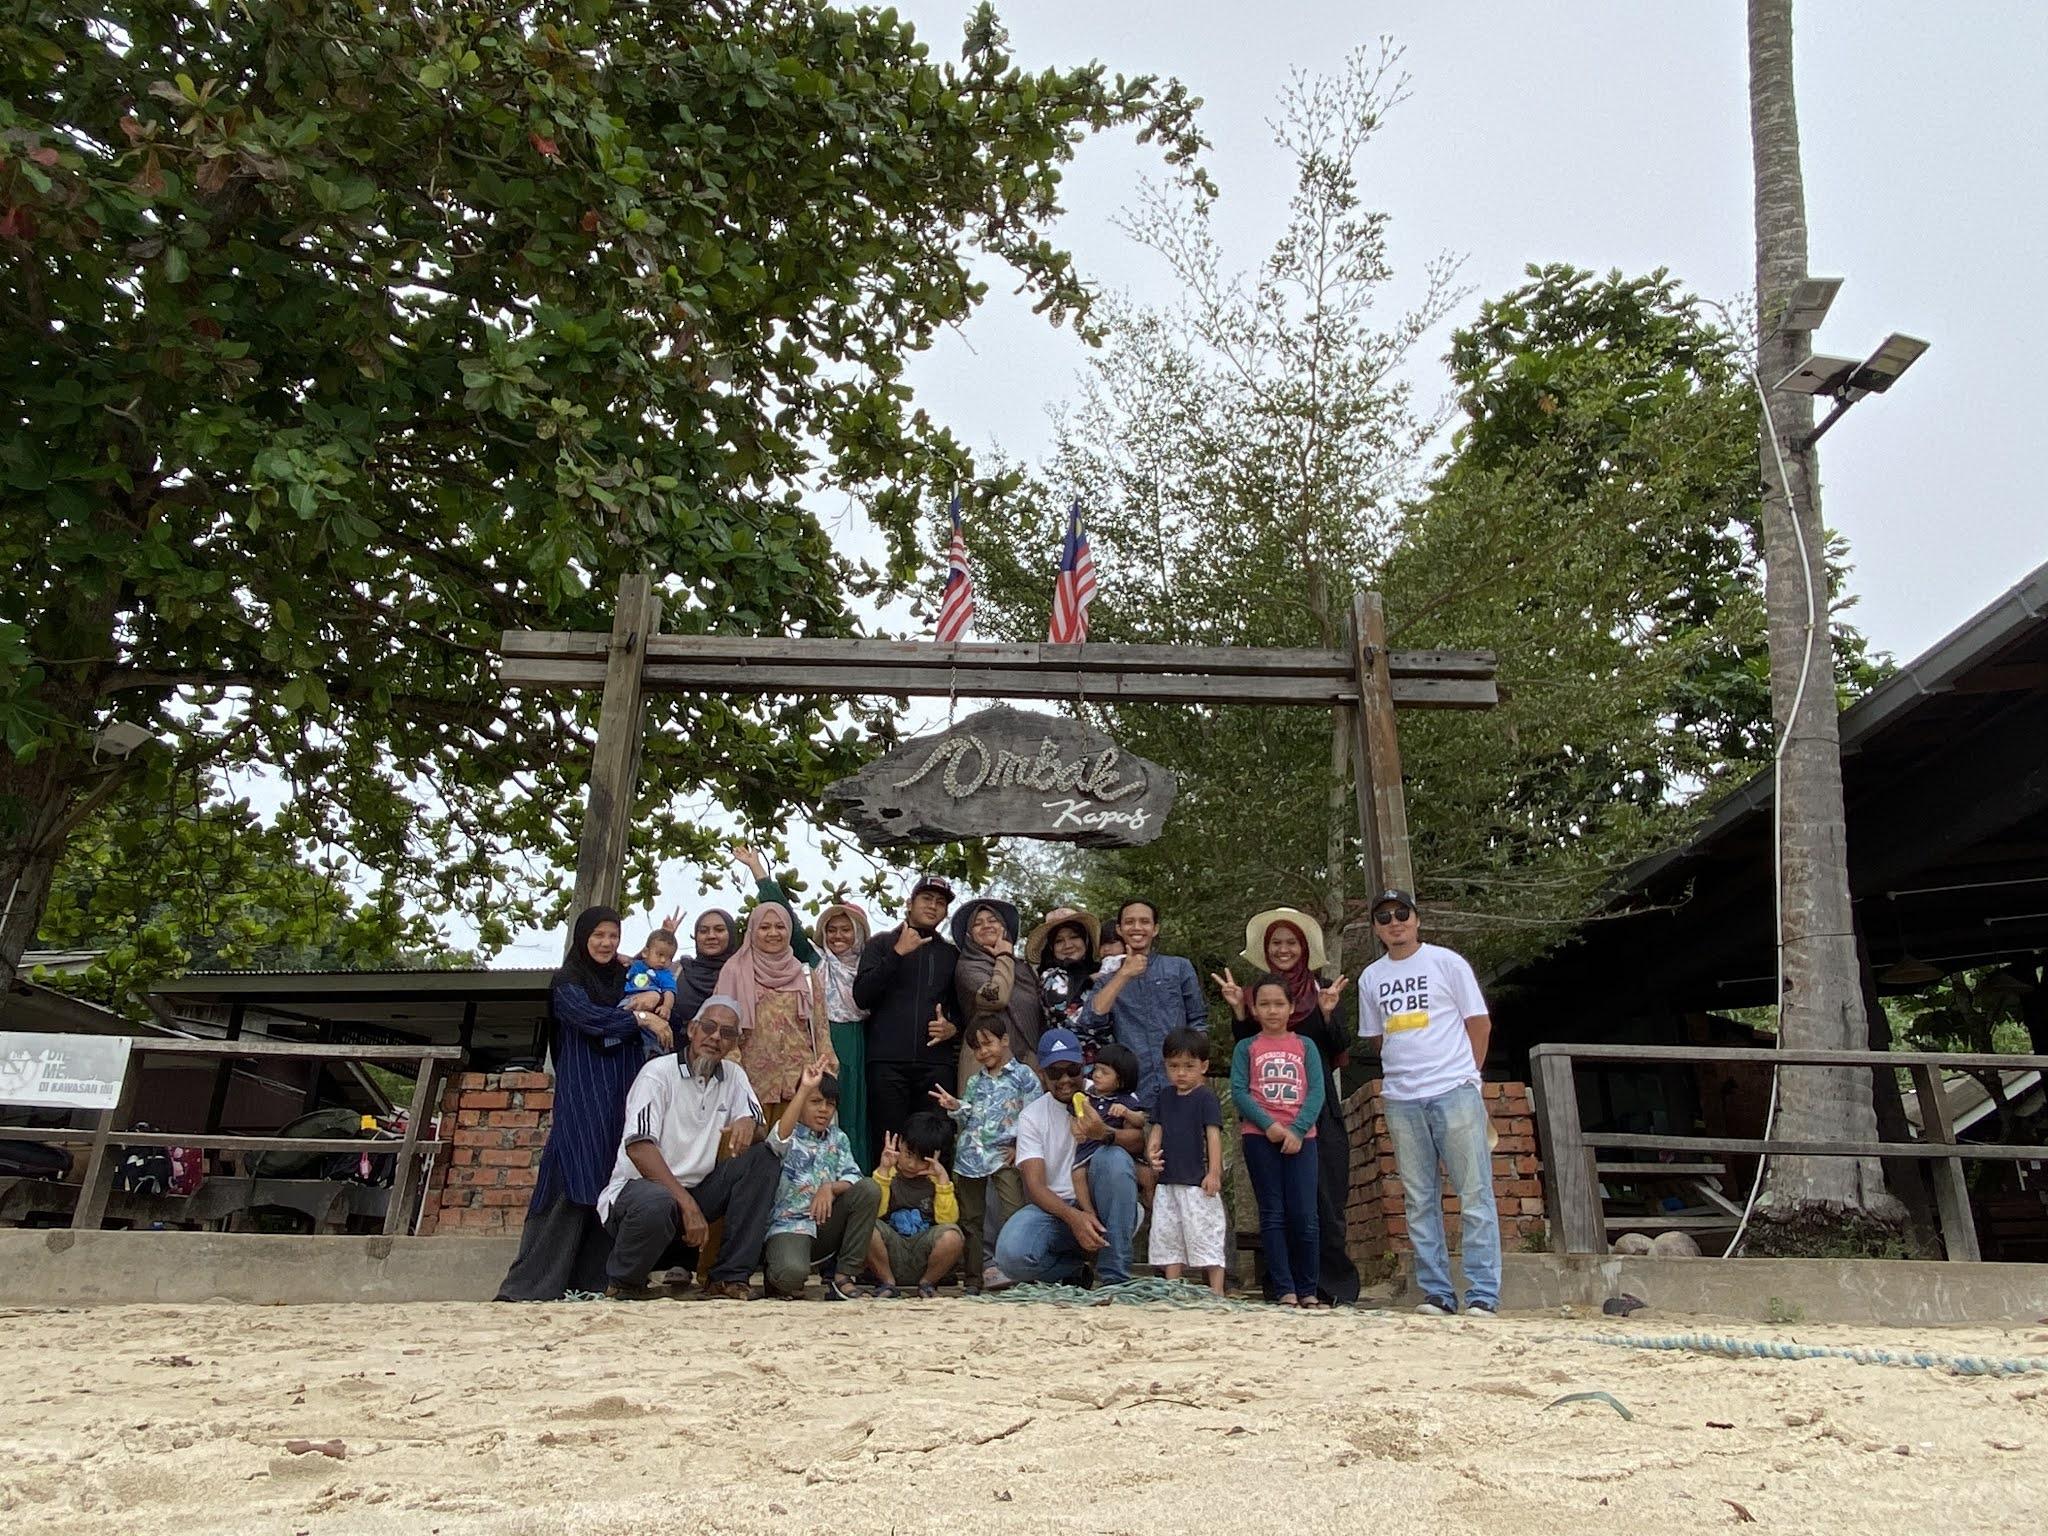 Ombak kapas resort, kapas island trip, package ombak kapas resort terengganu, ombak kapas resort terengganu review, snorkeling at kapas island,